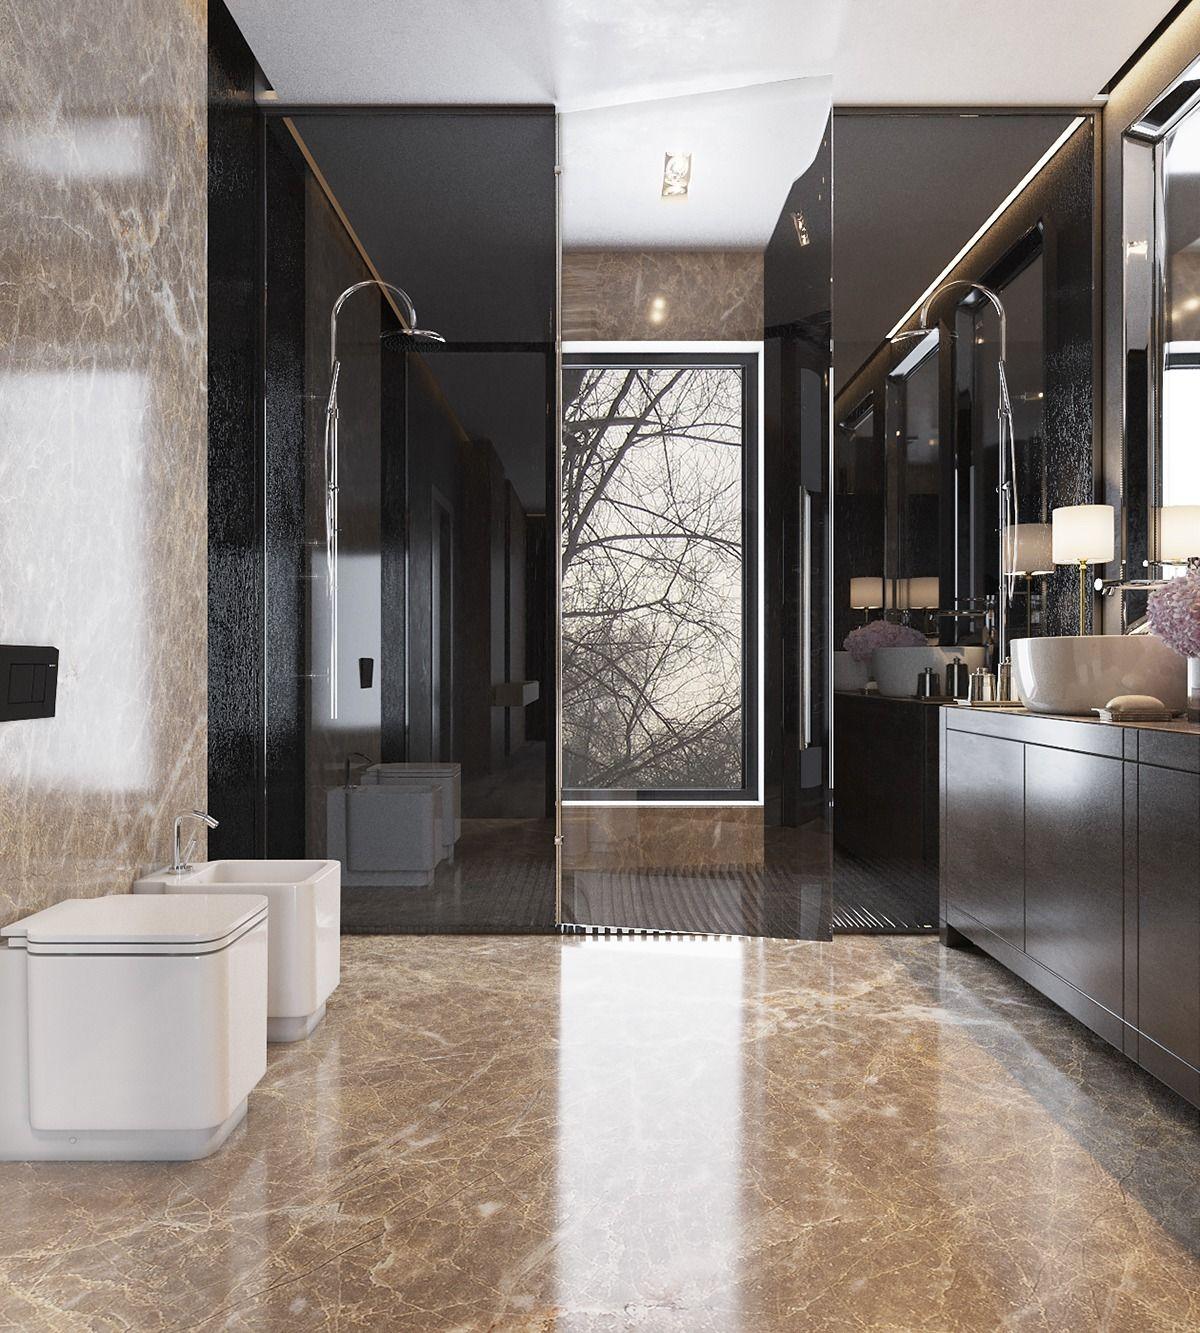 Modern Bathroom Designs Pinterest : Applying modern bathroom decor with creative and perfect